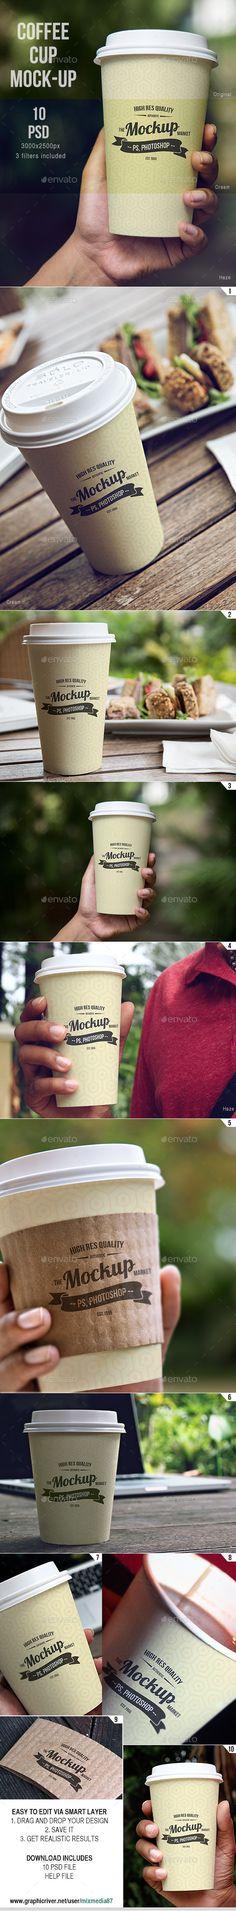 Coffee Cup Mockup - Product Mock-Ups Graphics Mockup Photoshop, Photoshop Design, Coffee Cup Design, Bag Mockup, Mockup Templates, Media Design, Packaging Design, Coffee Cups, Mockup Generator